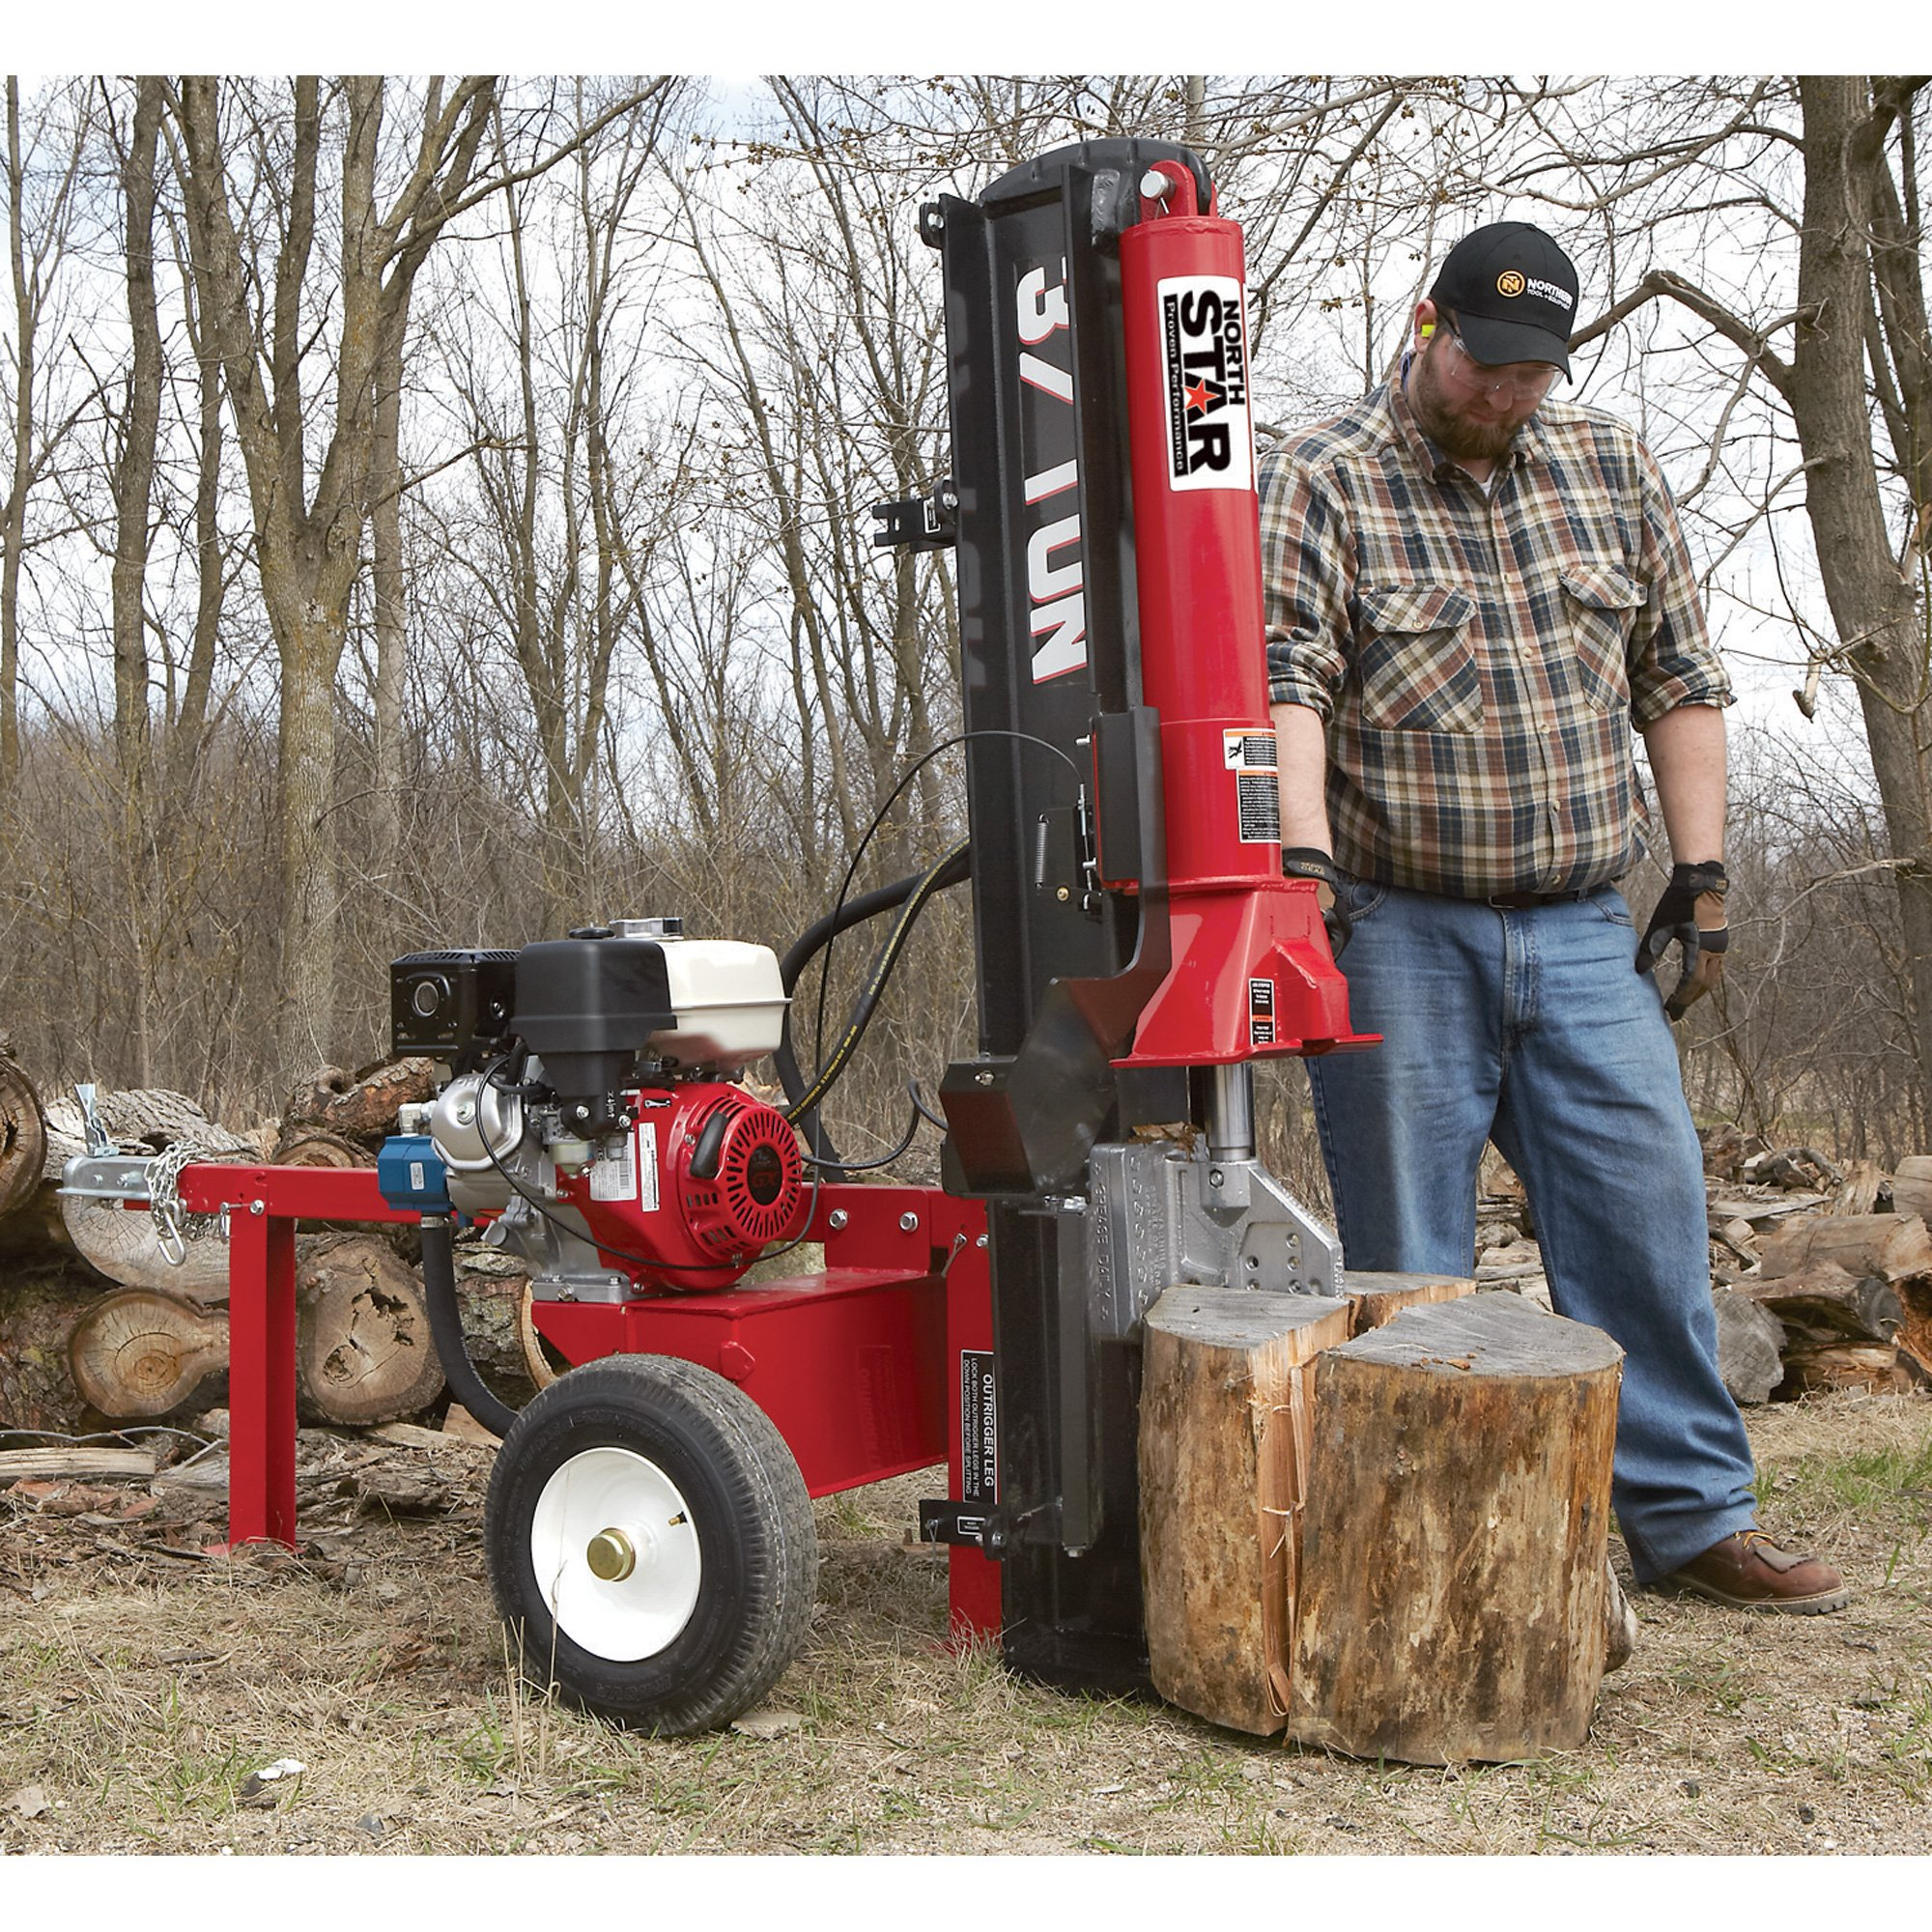 NorthStar Horizontal/Vertical Log Splitter - 37-Ton, 270cc Honda GX270 Engine